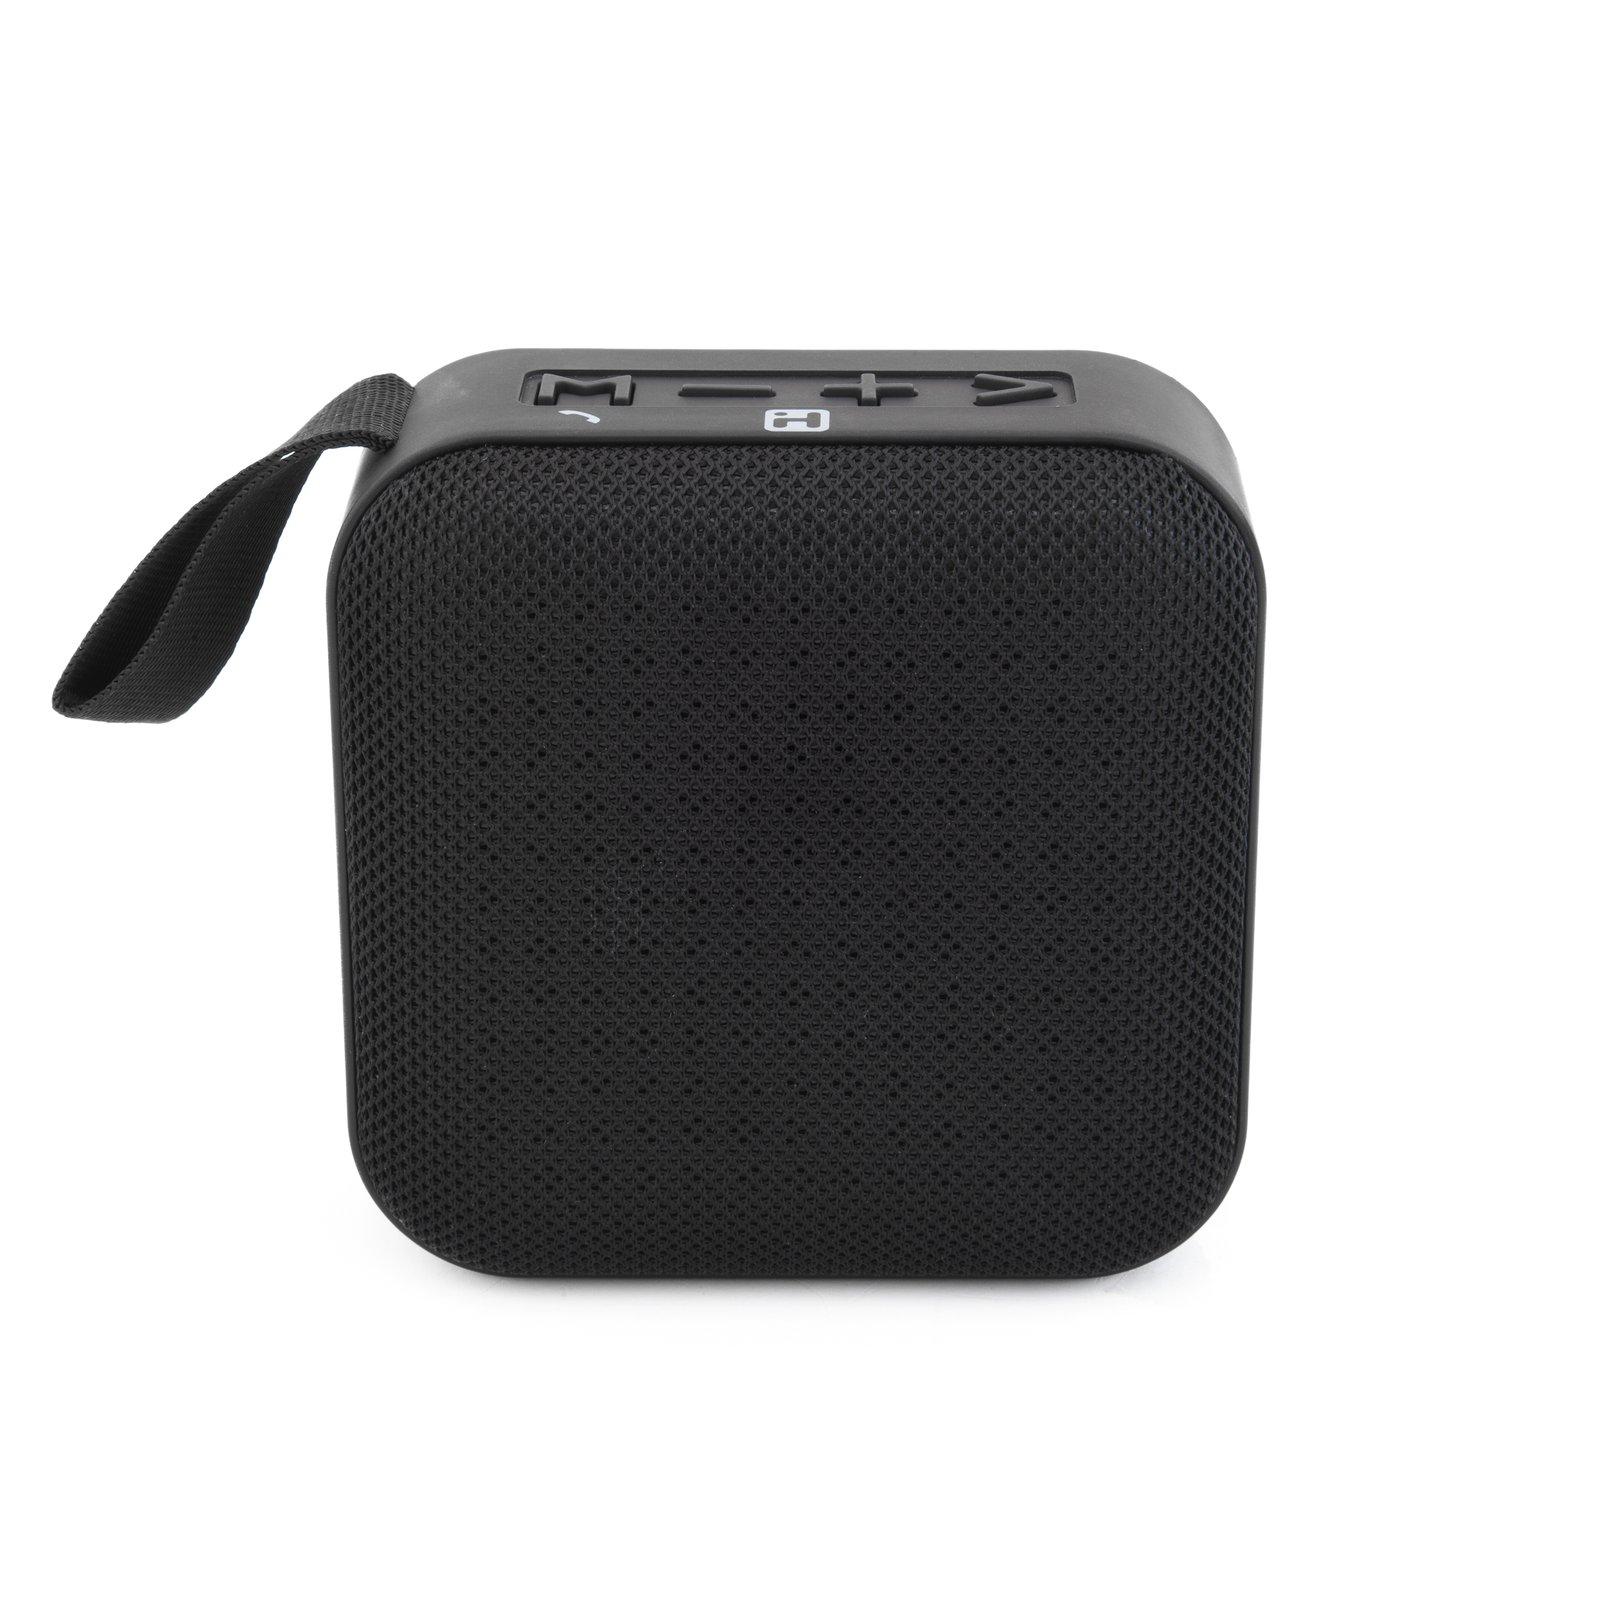 iHome iHv10 Wireless Speaker with Enhanced Bass